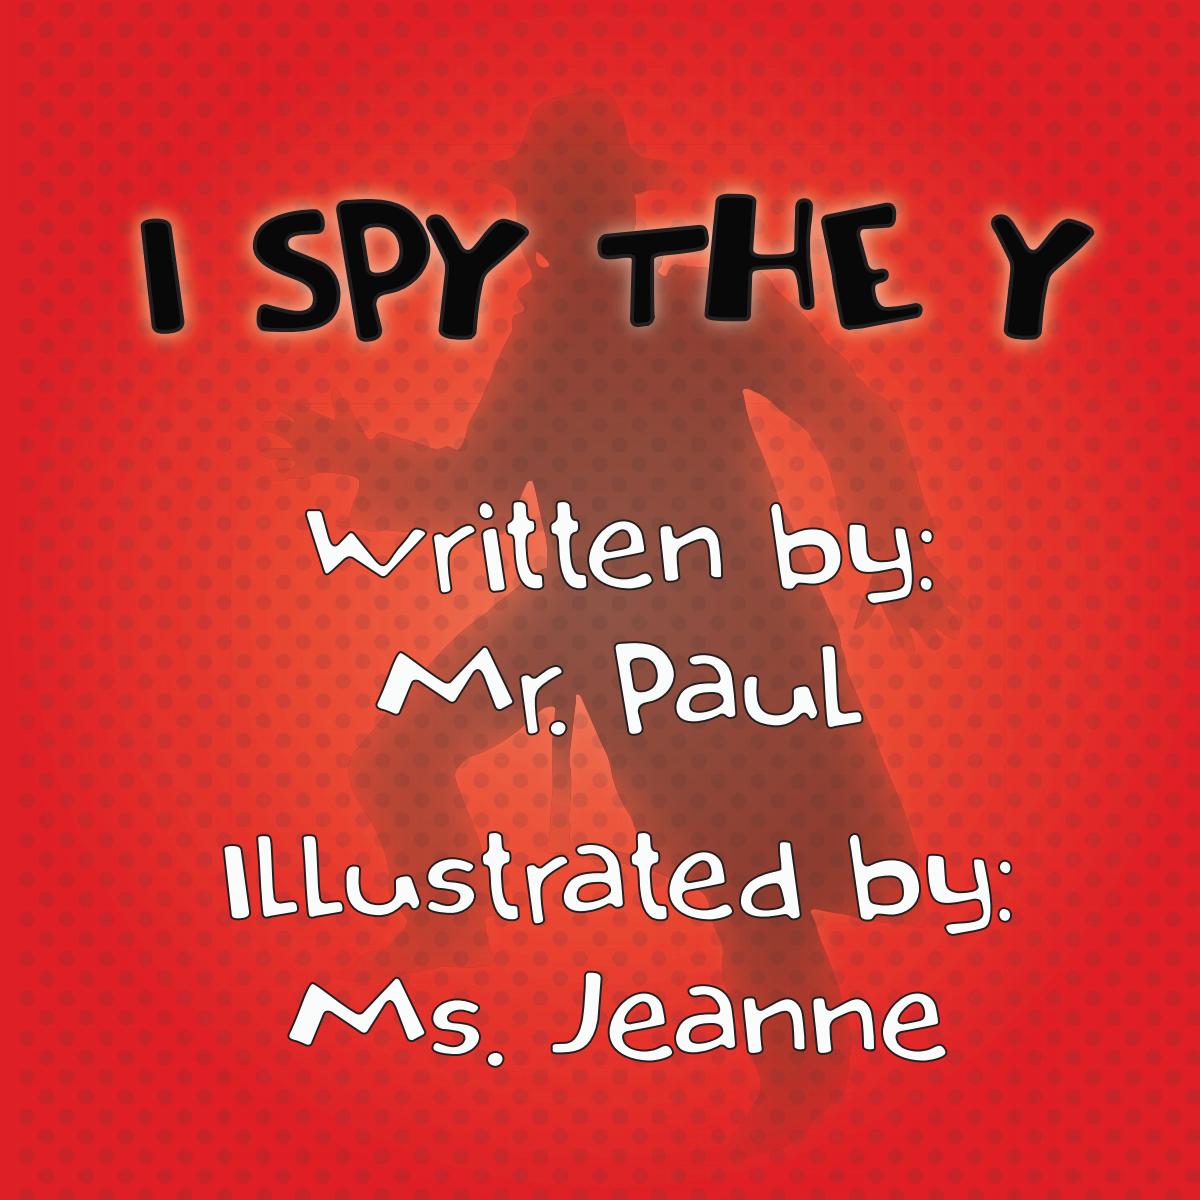 I spy the y